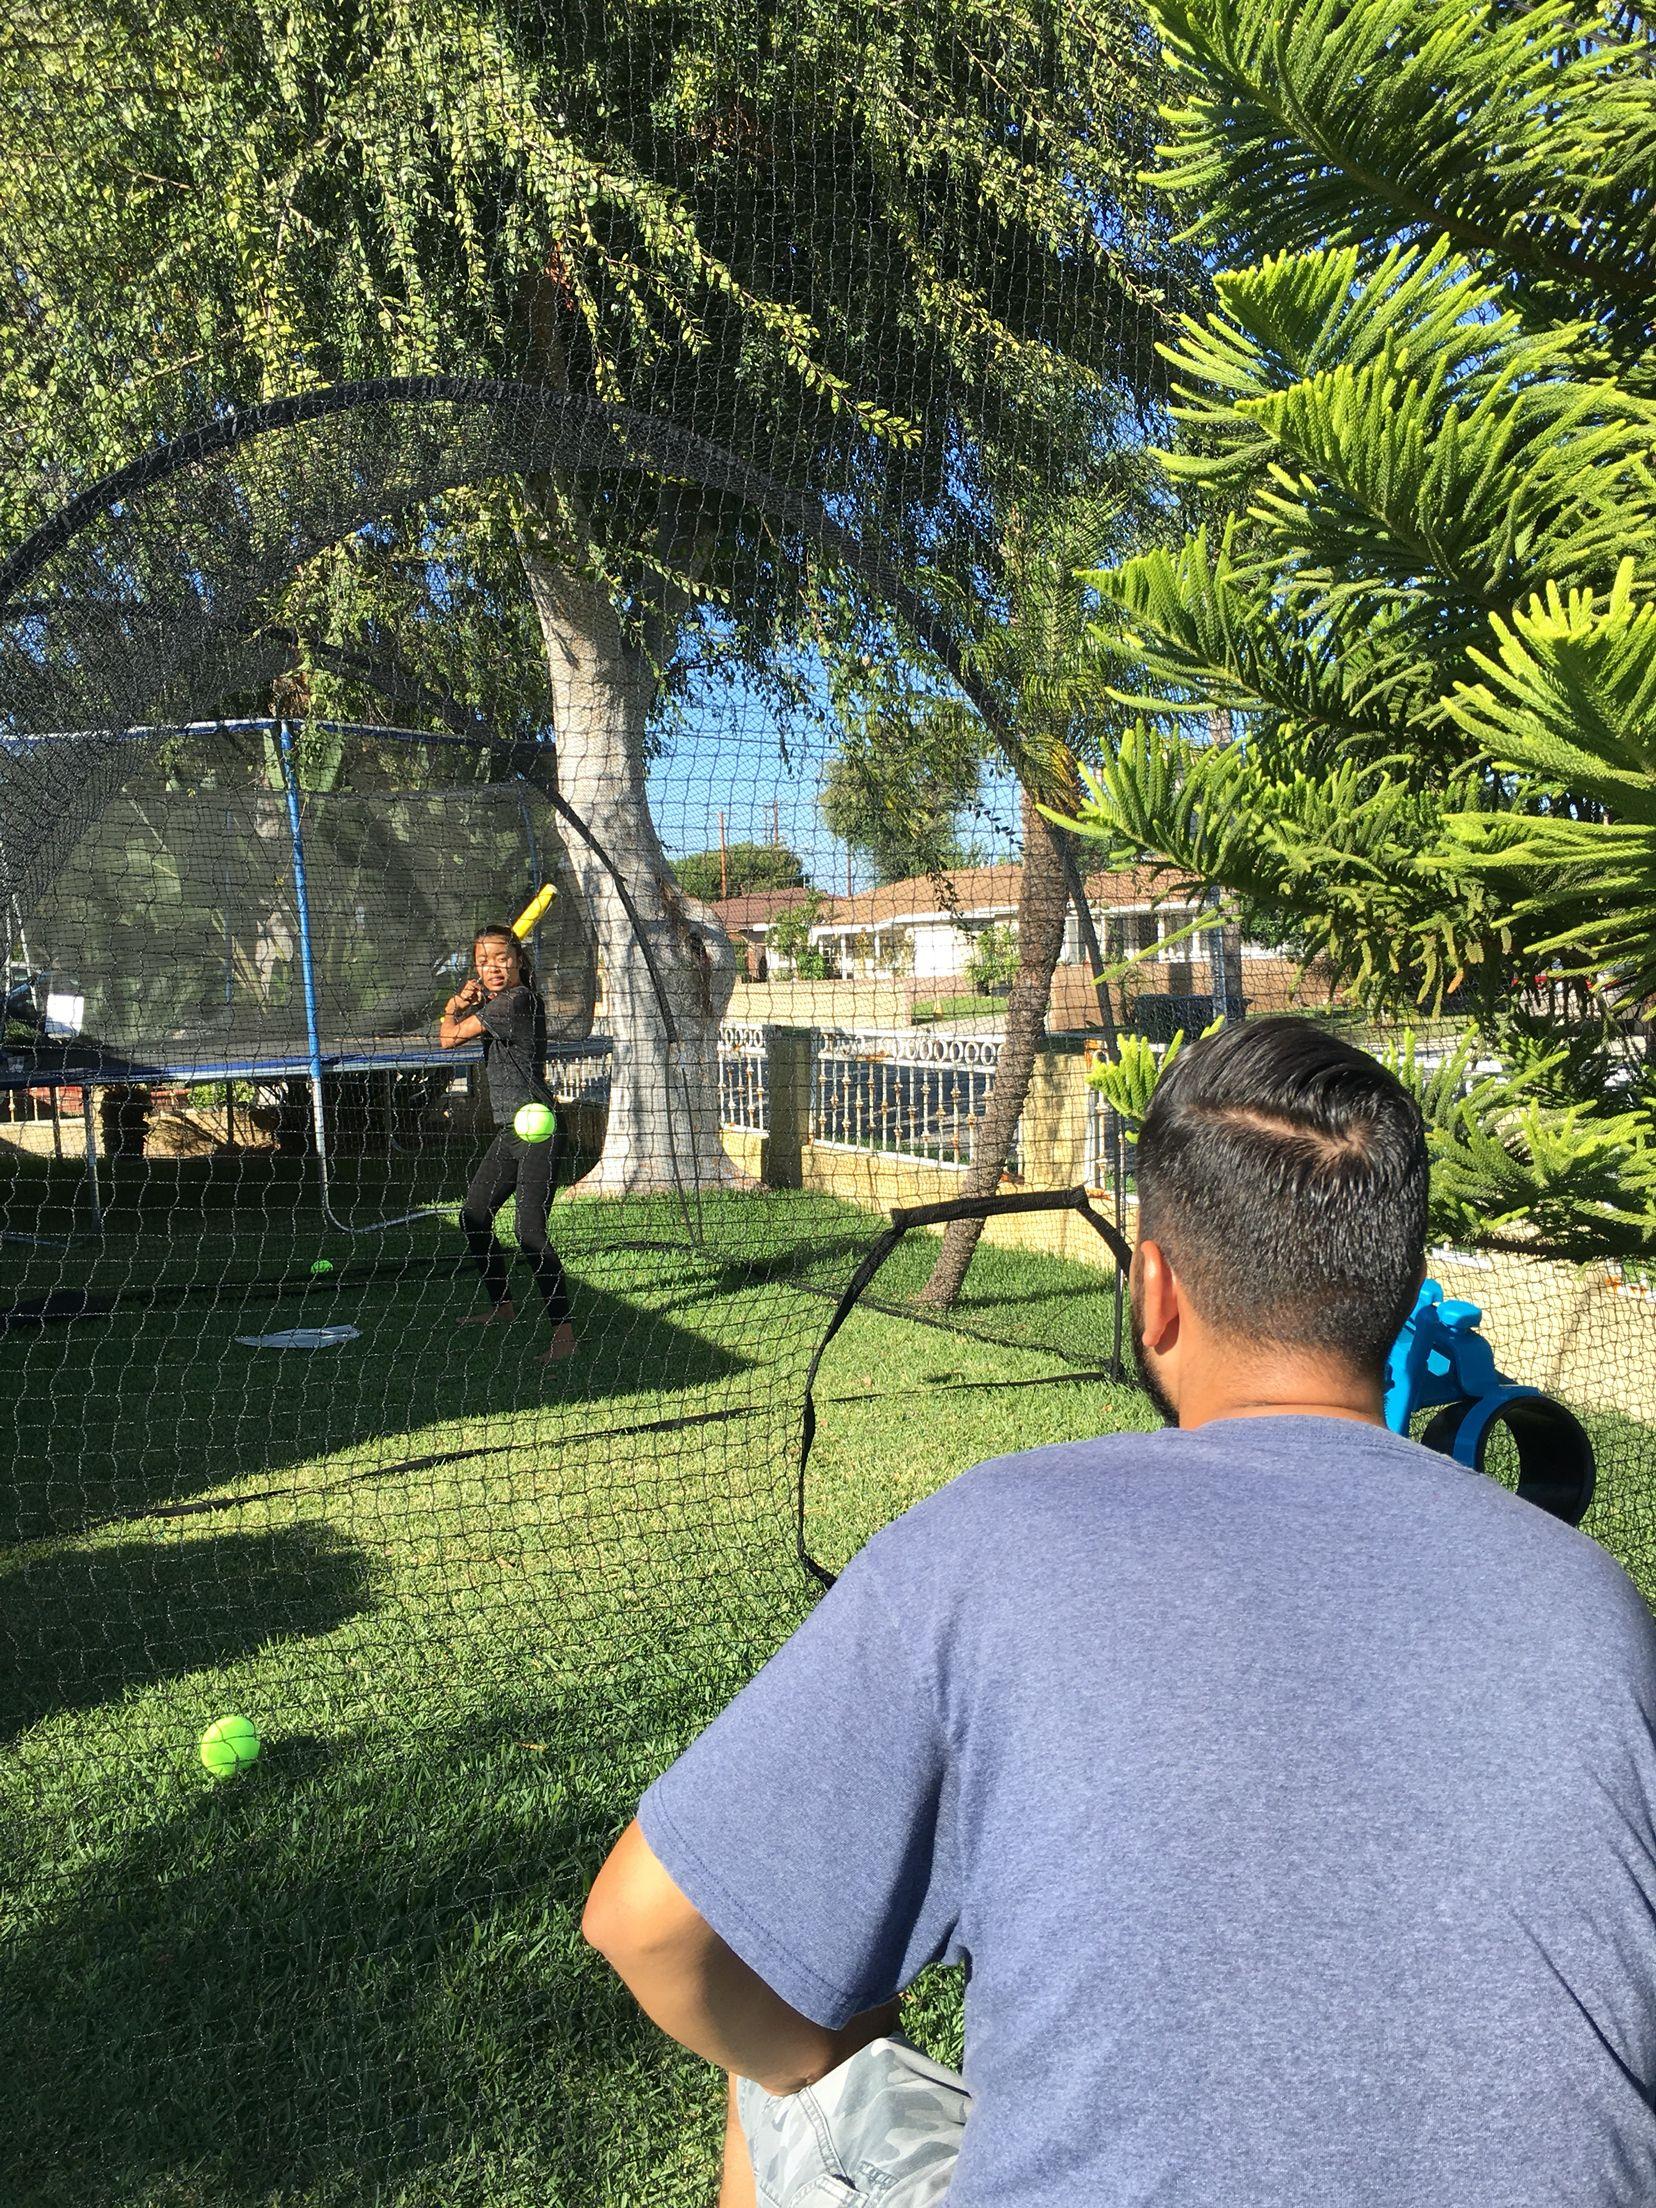 Baseball practice with pitching machine rental batting